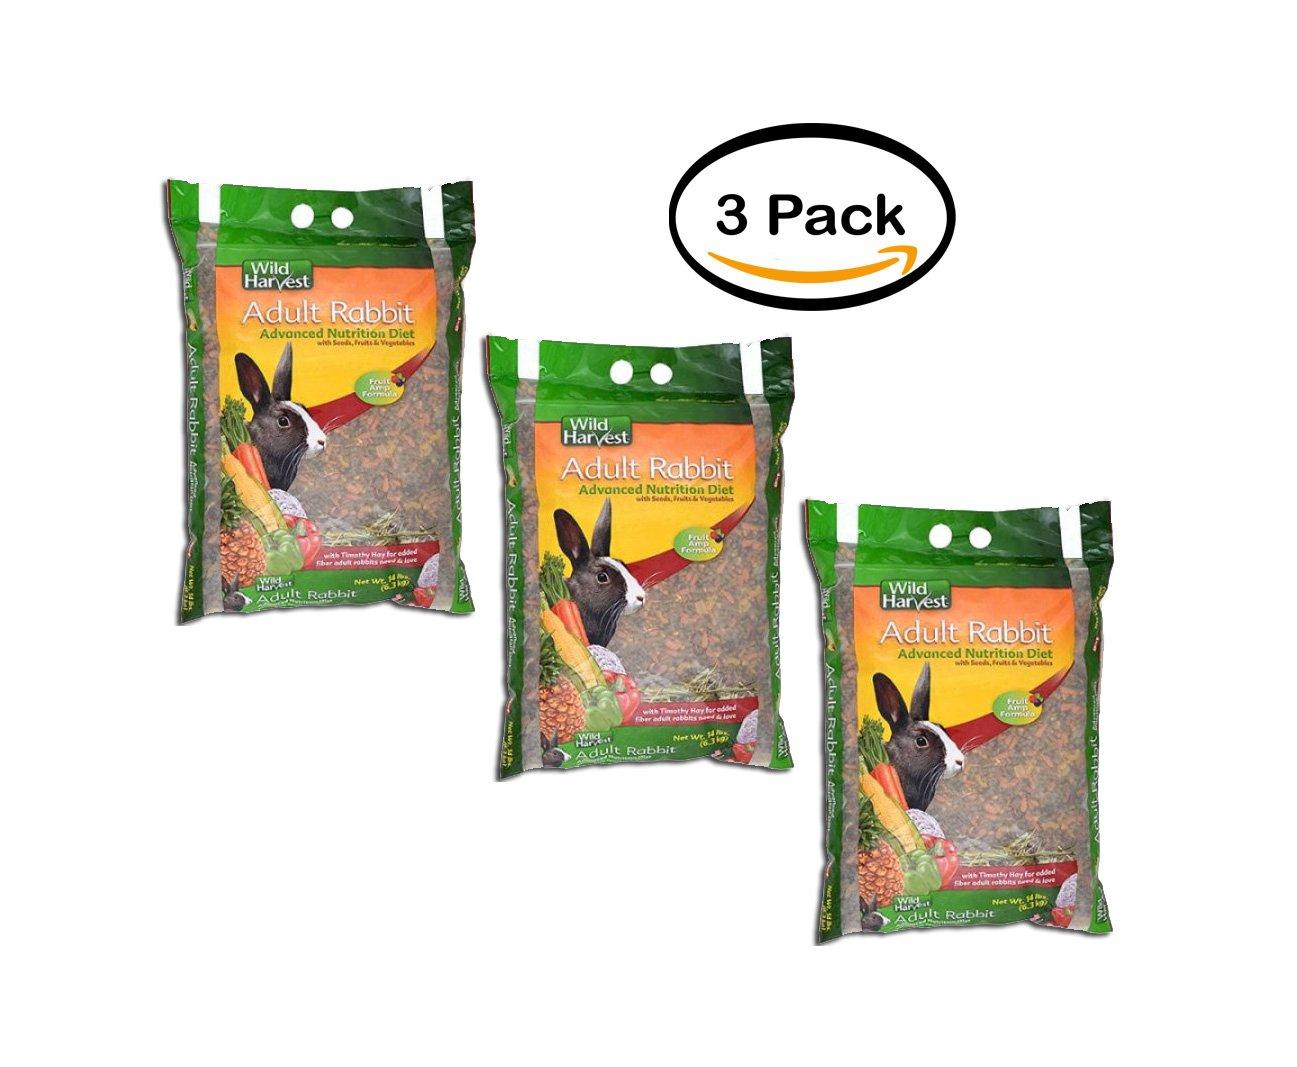 PACK OF 3 - Wild Harvest Rabbit Diet Food 14 lbs